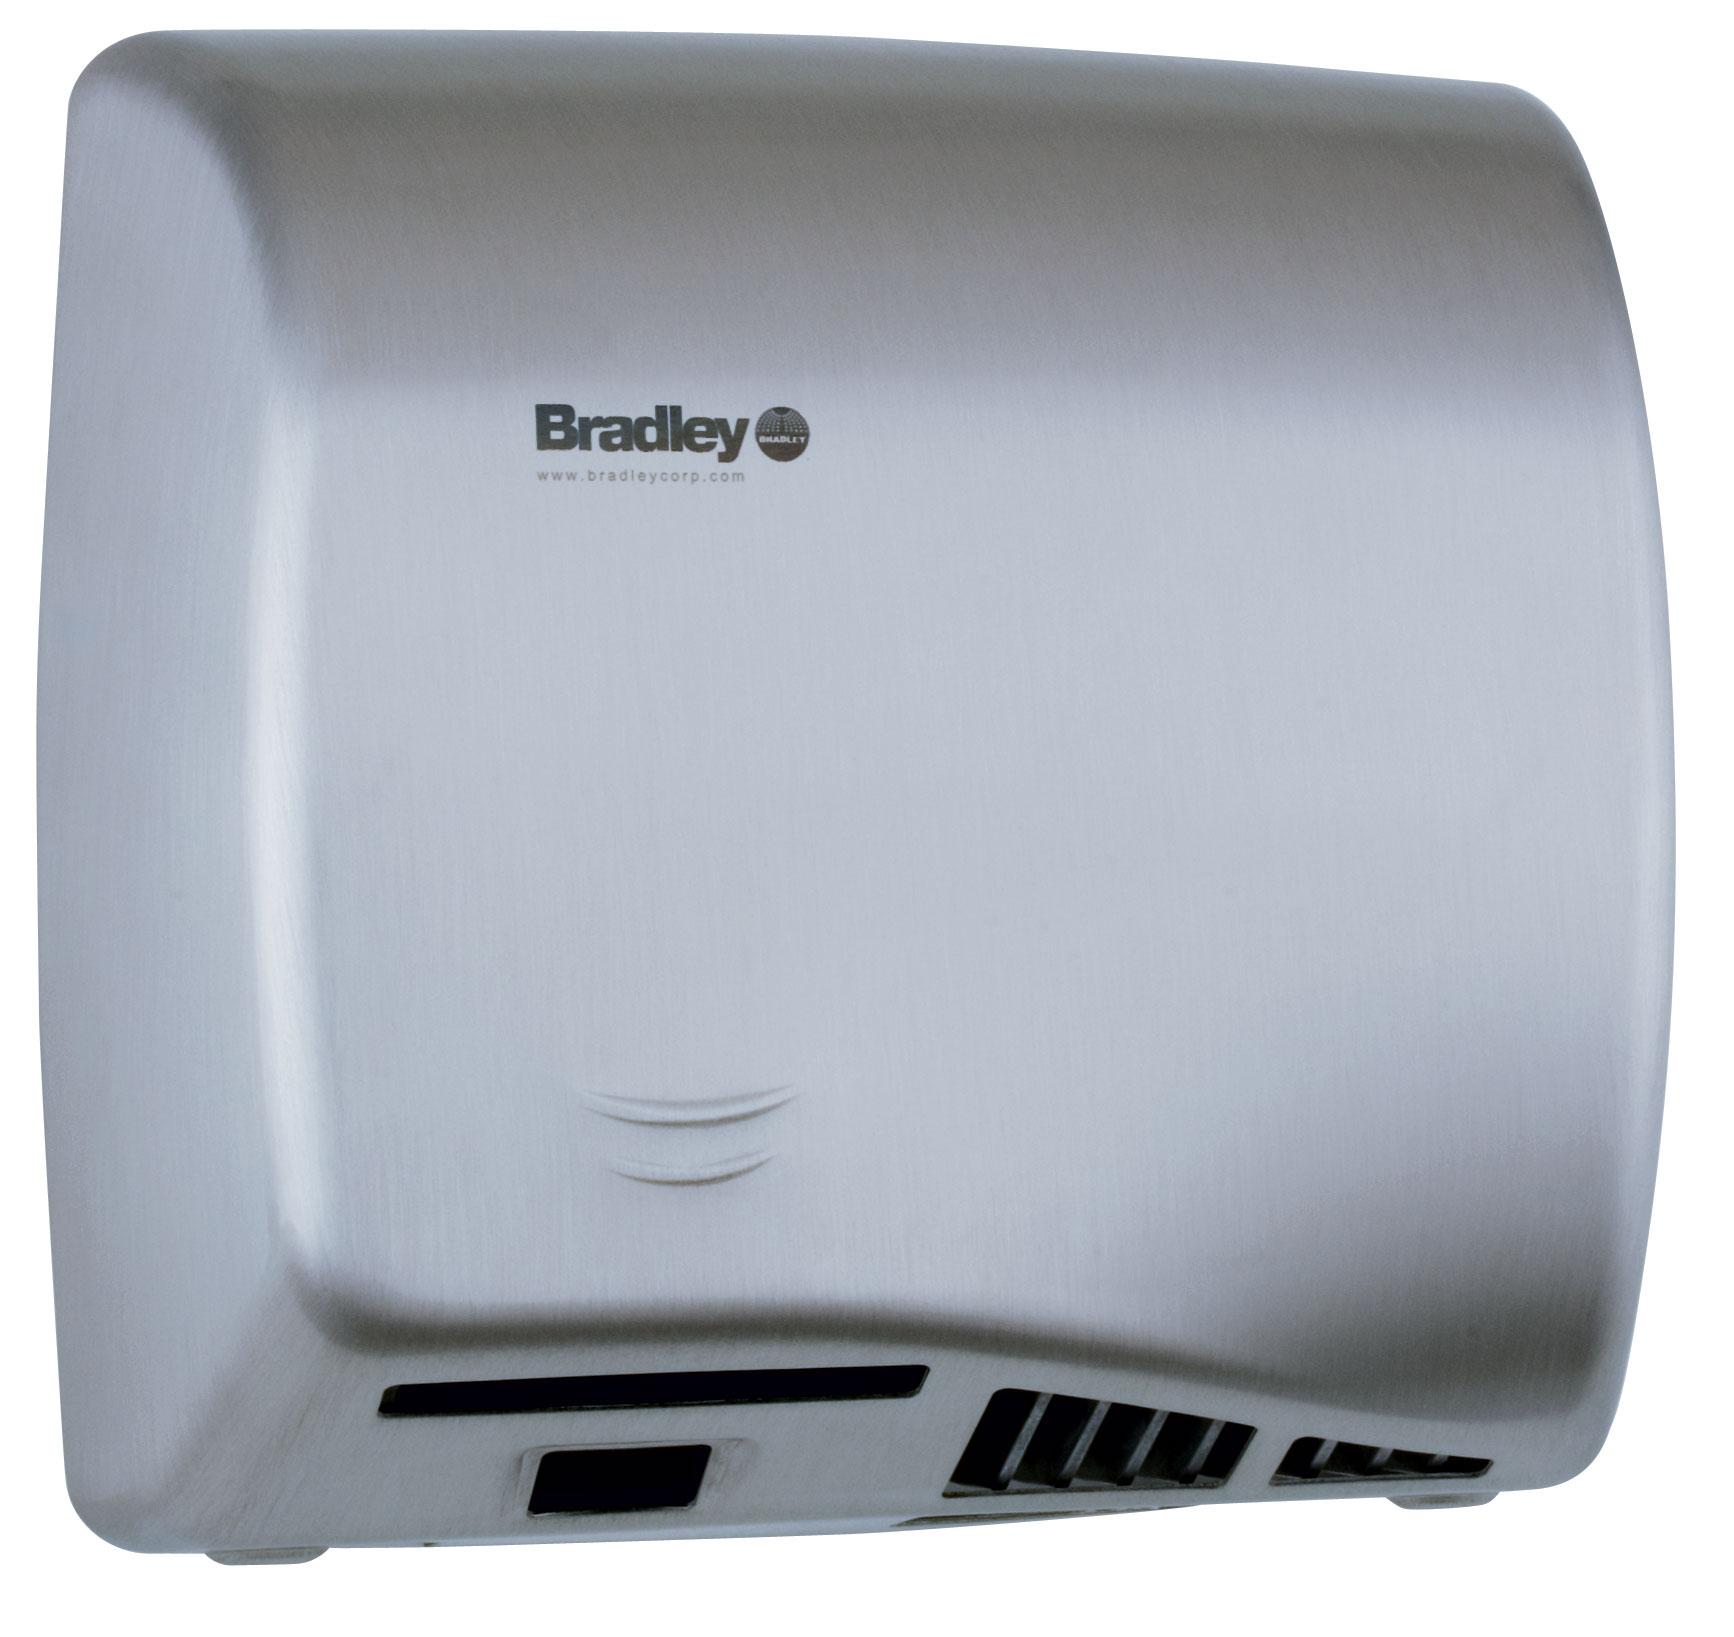 Bradley Aerix 2902-2874 Satin Stainless Steel Adjustable Sensor-Operated Hand Dryer